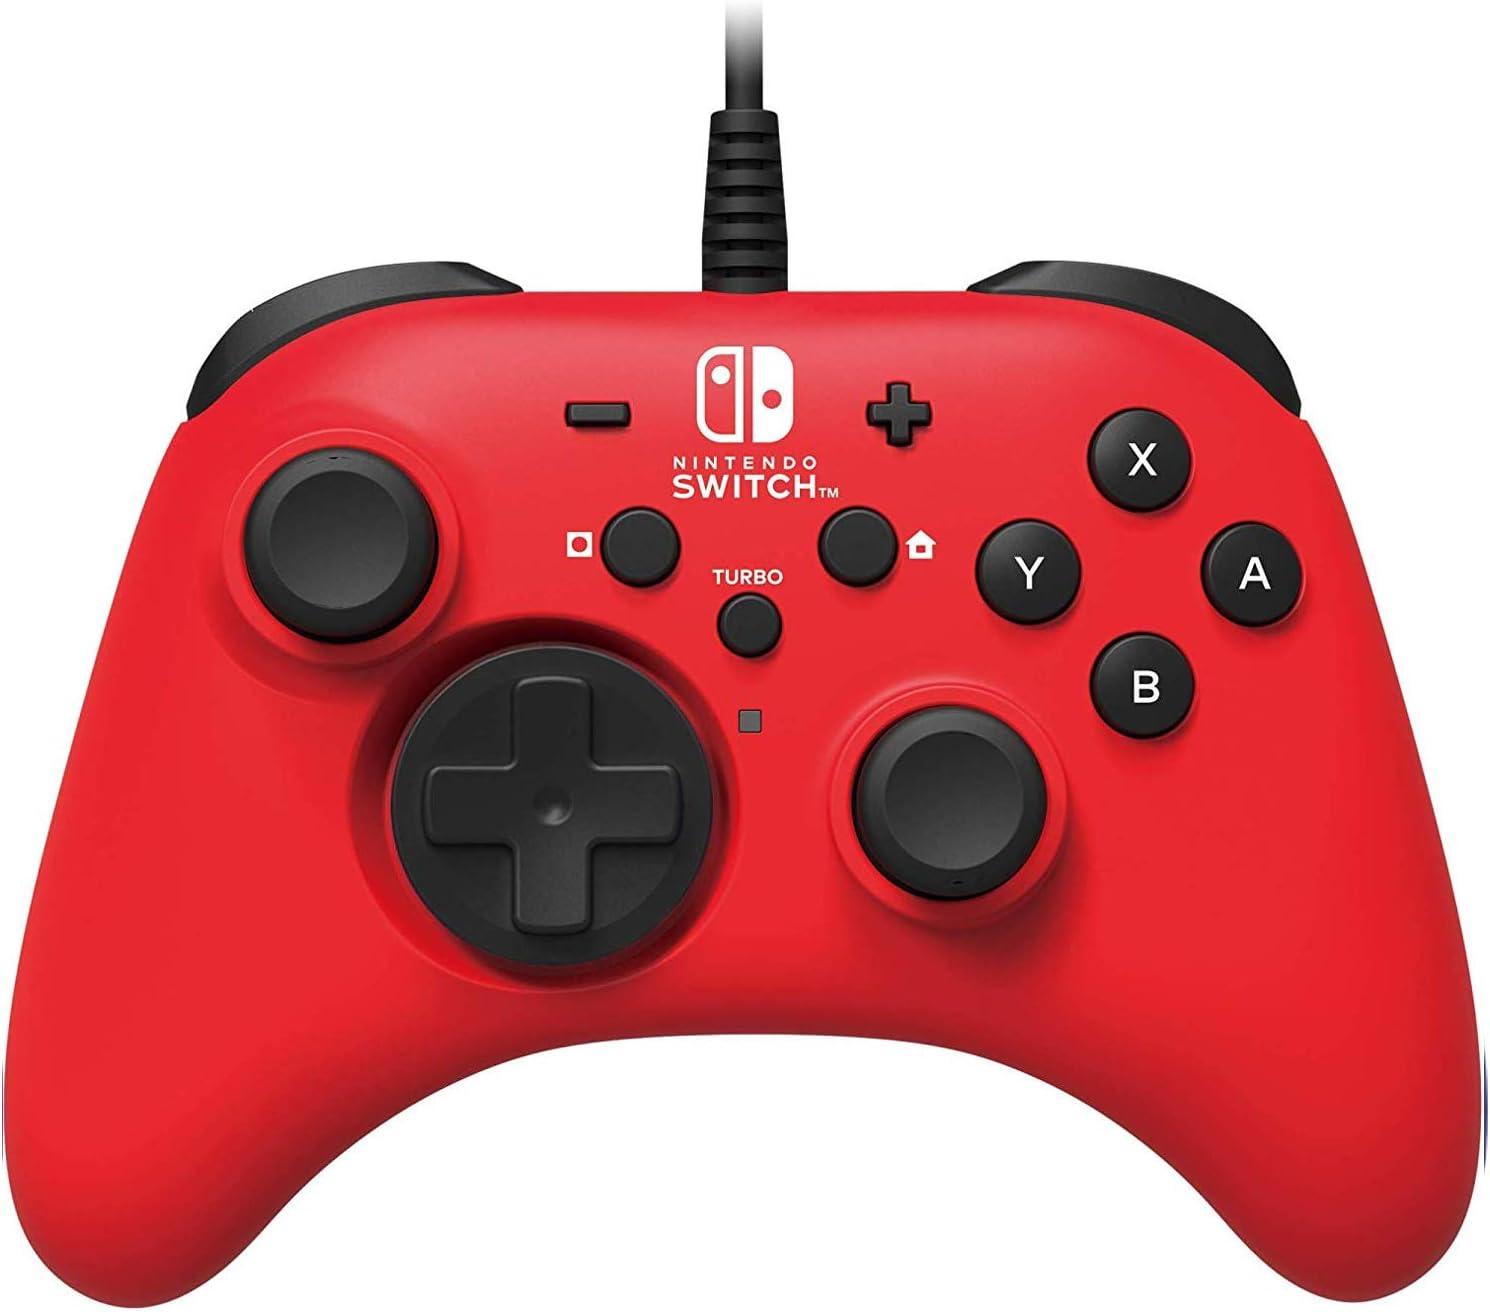 Mando Horipad Nintendo Switch - Amazon